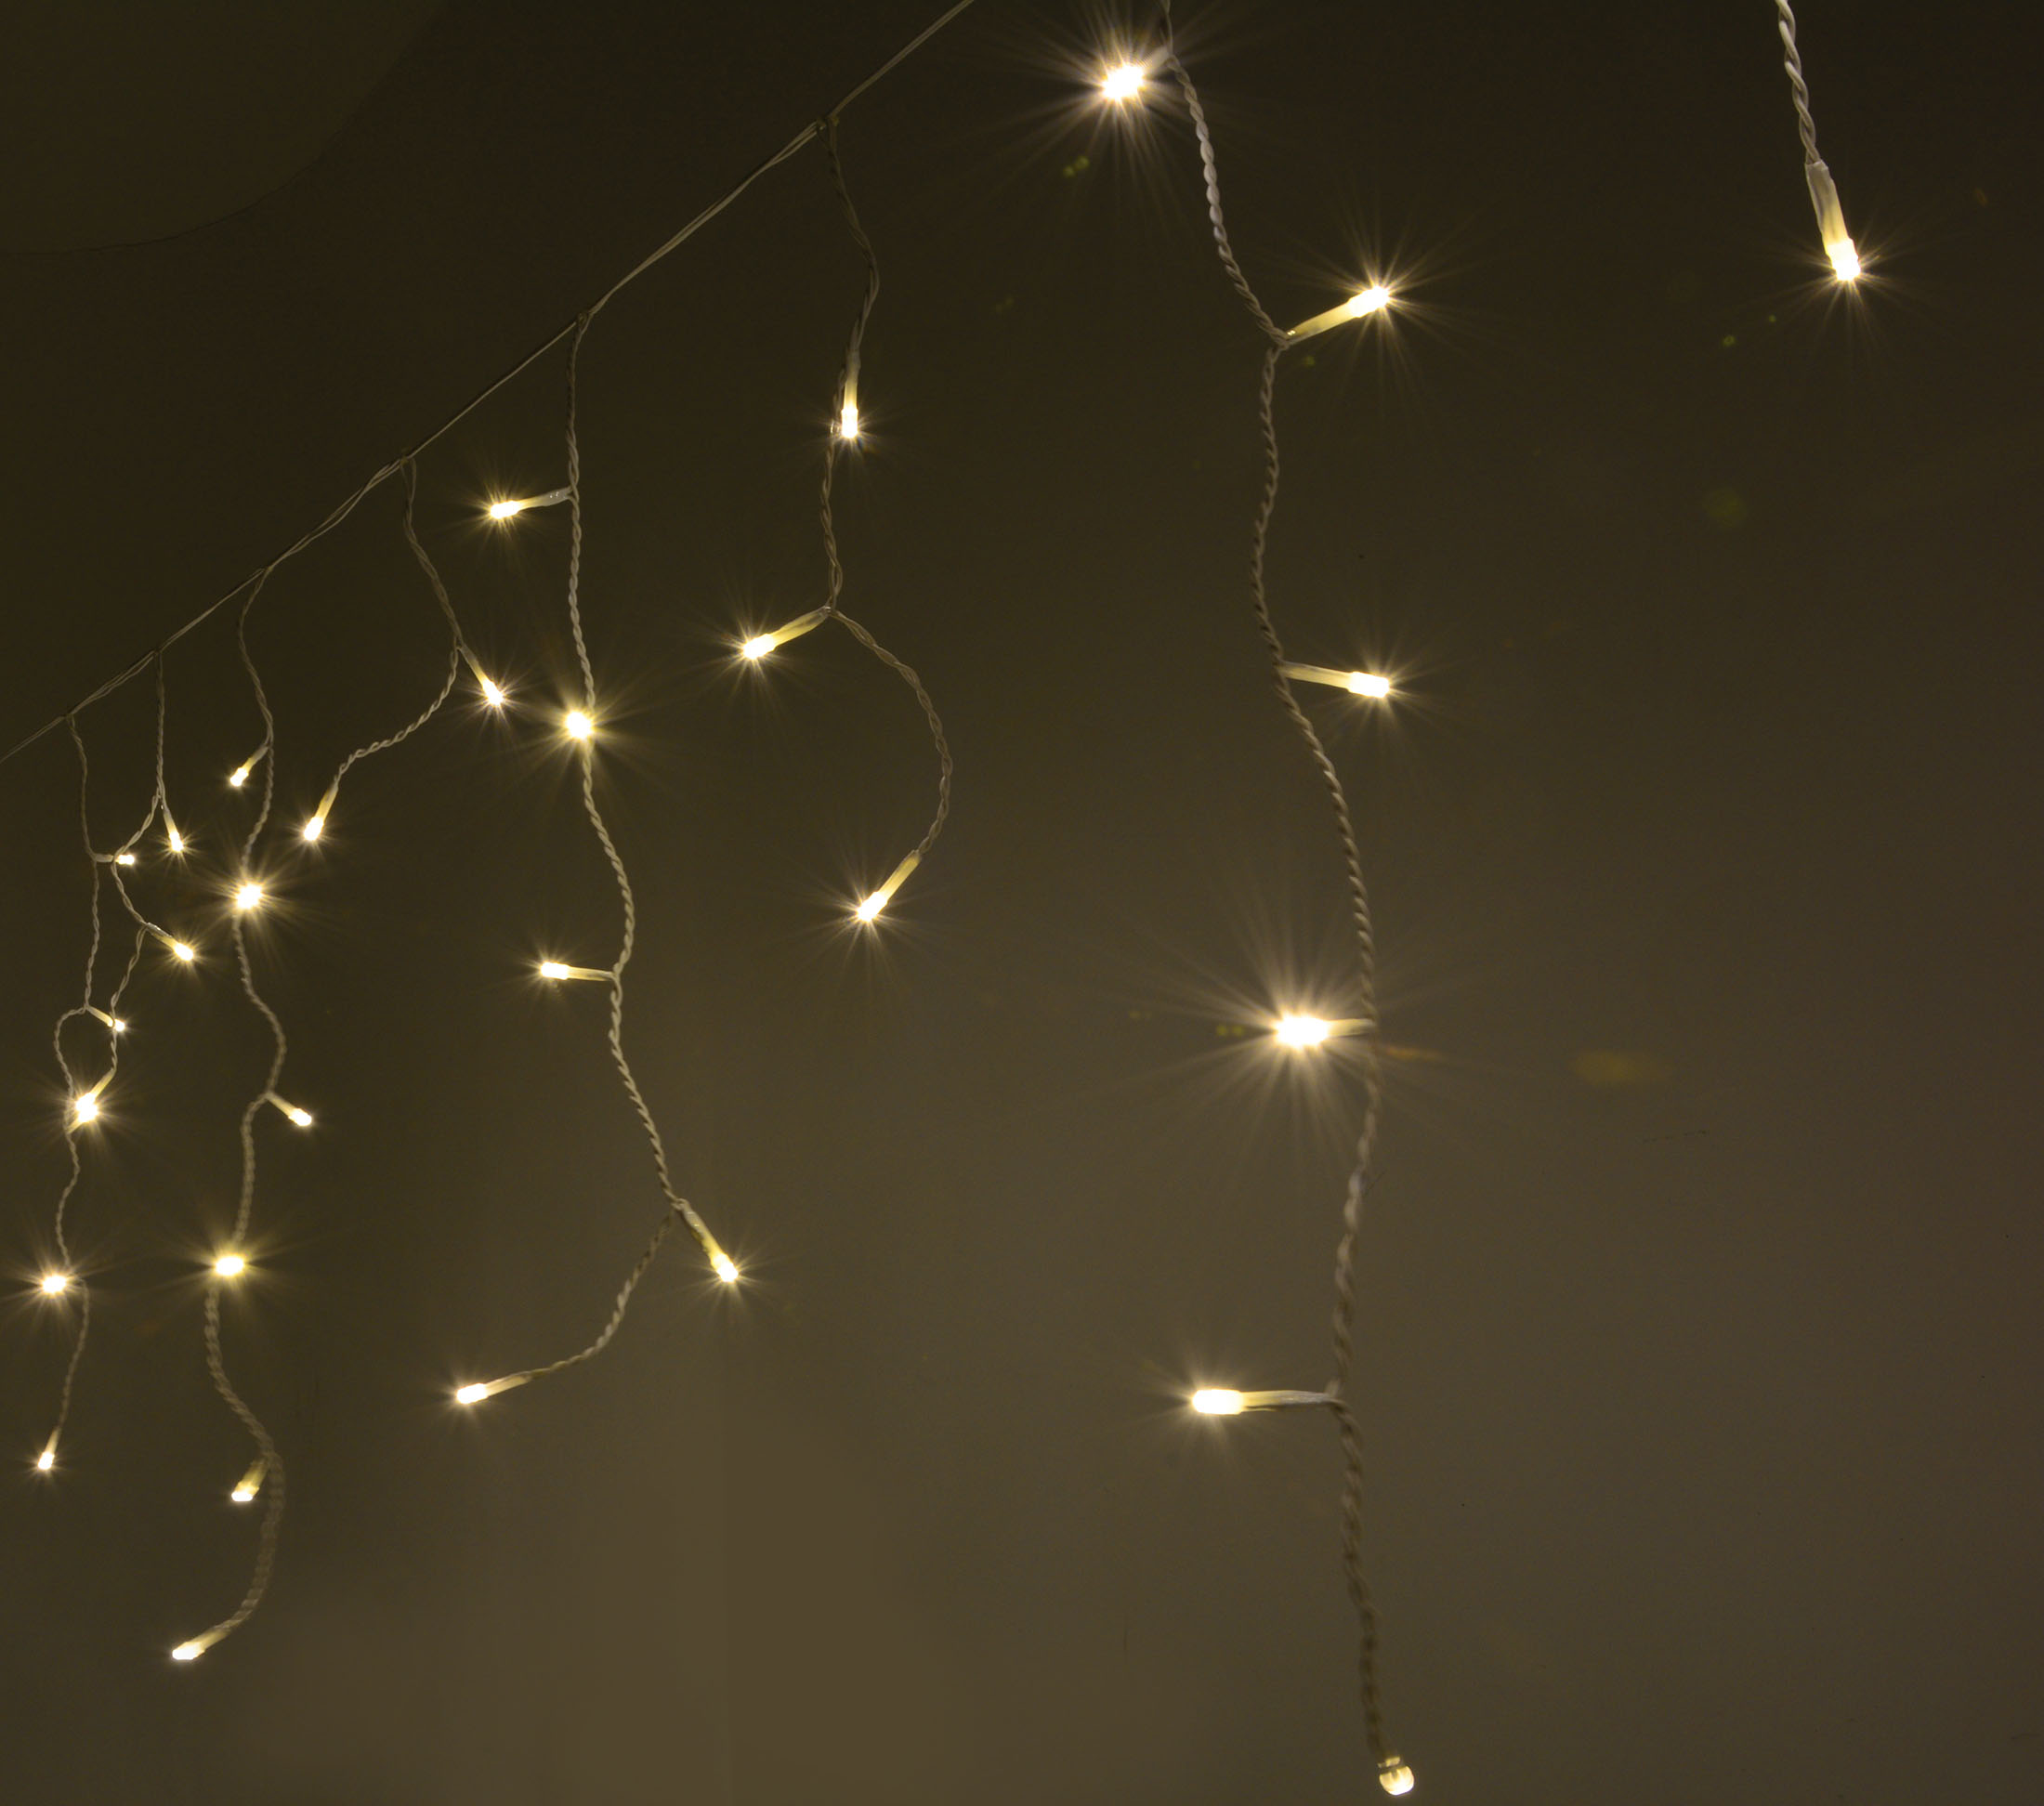 Single Color String Lights : icicle led string light sets - 28 images - 197x6b3109, lights string lights lights winter, ge ...